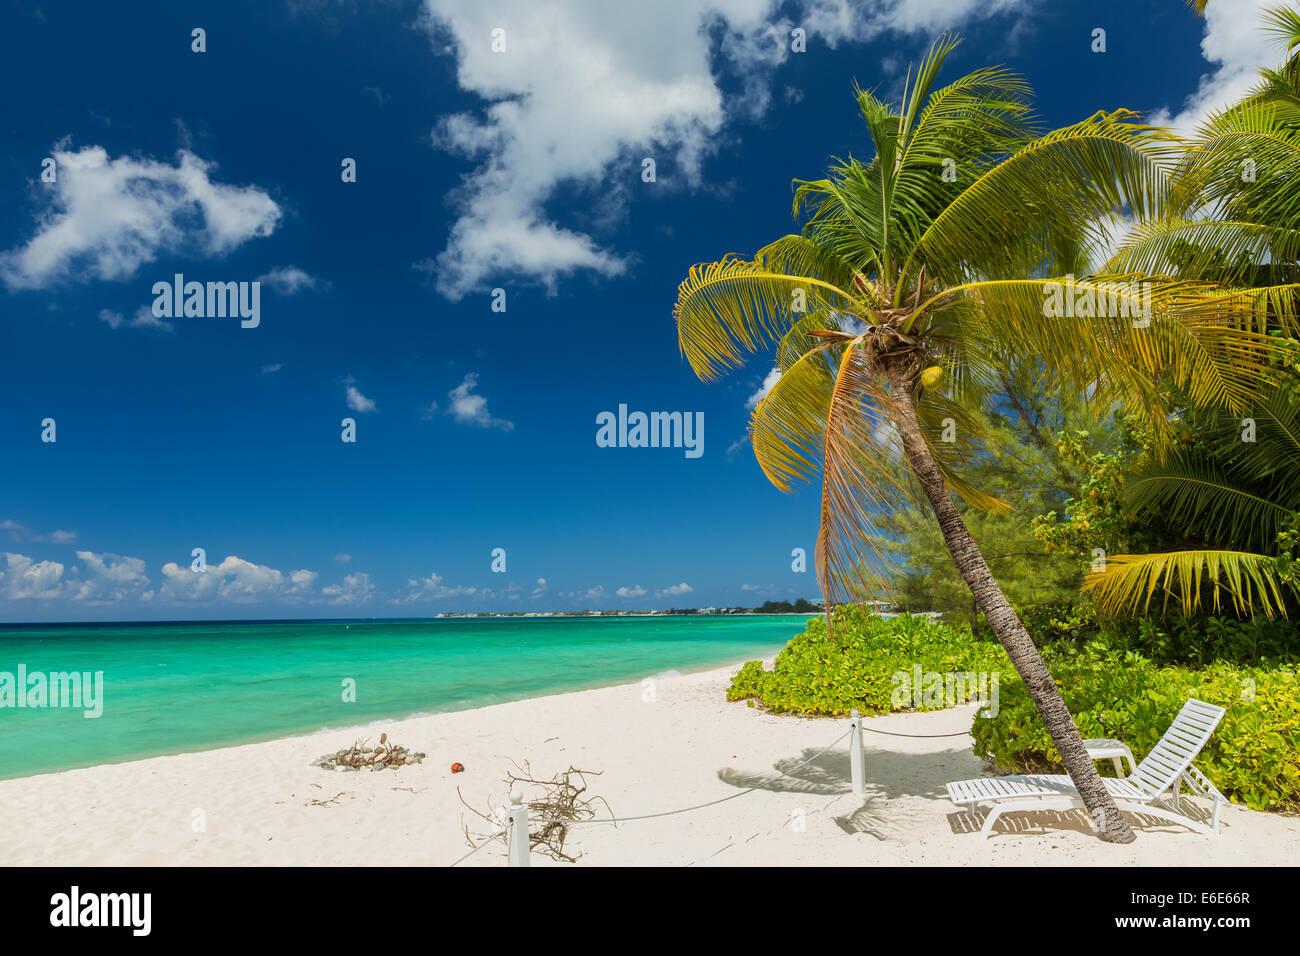 7 mile beach, Grand Cayman - Stock Image